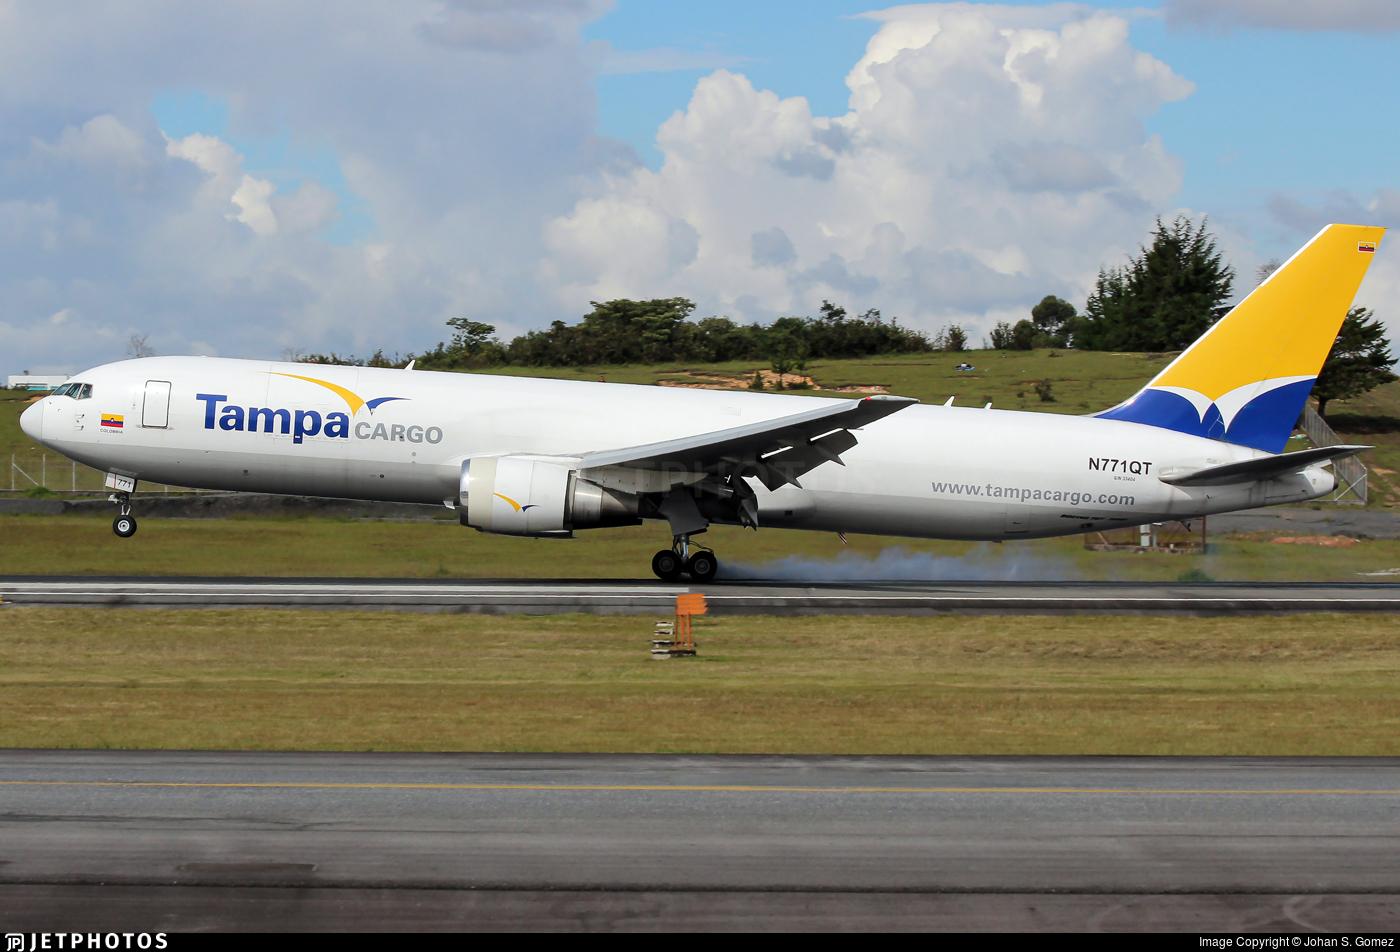 N771QT - Boeing 767-381F(ER) - Tampa Cargo